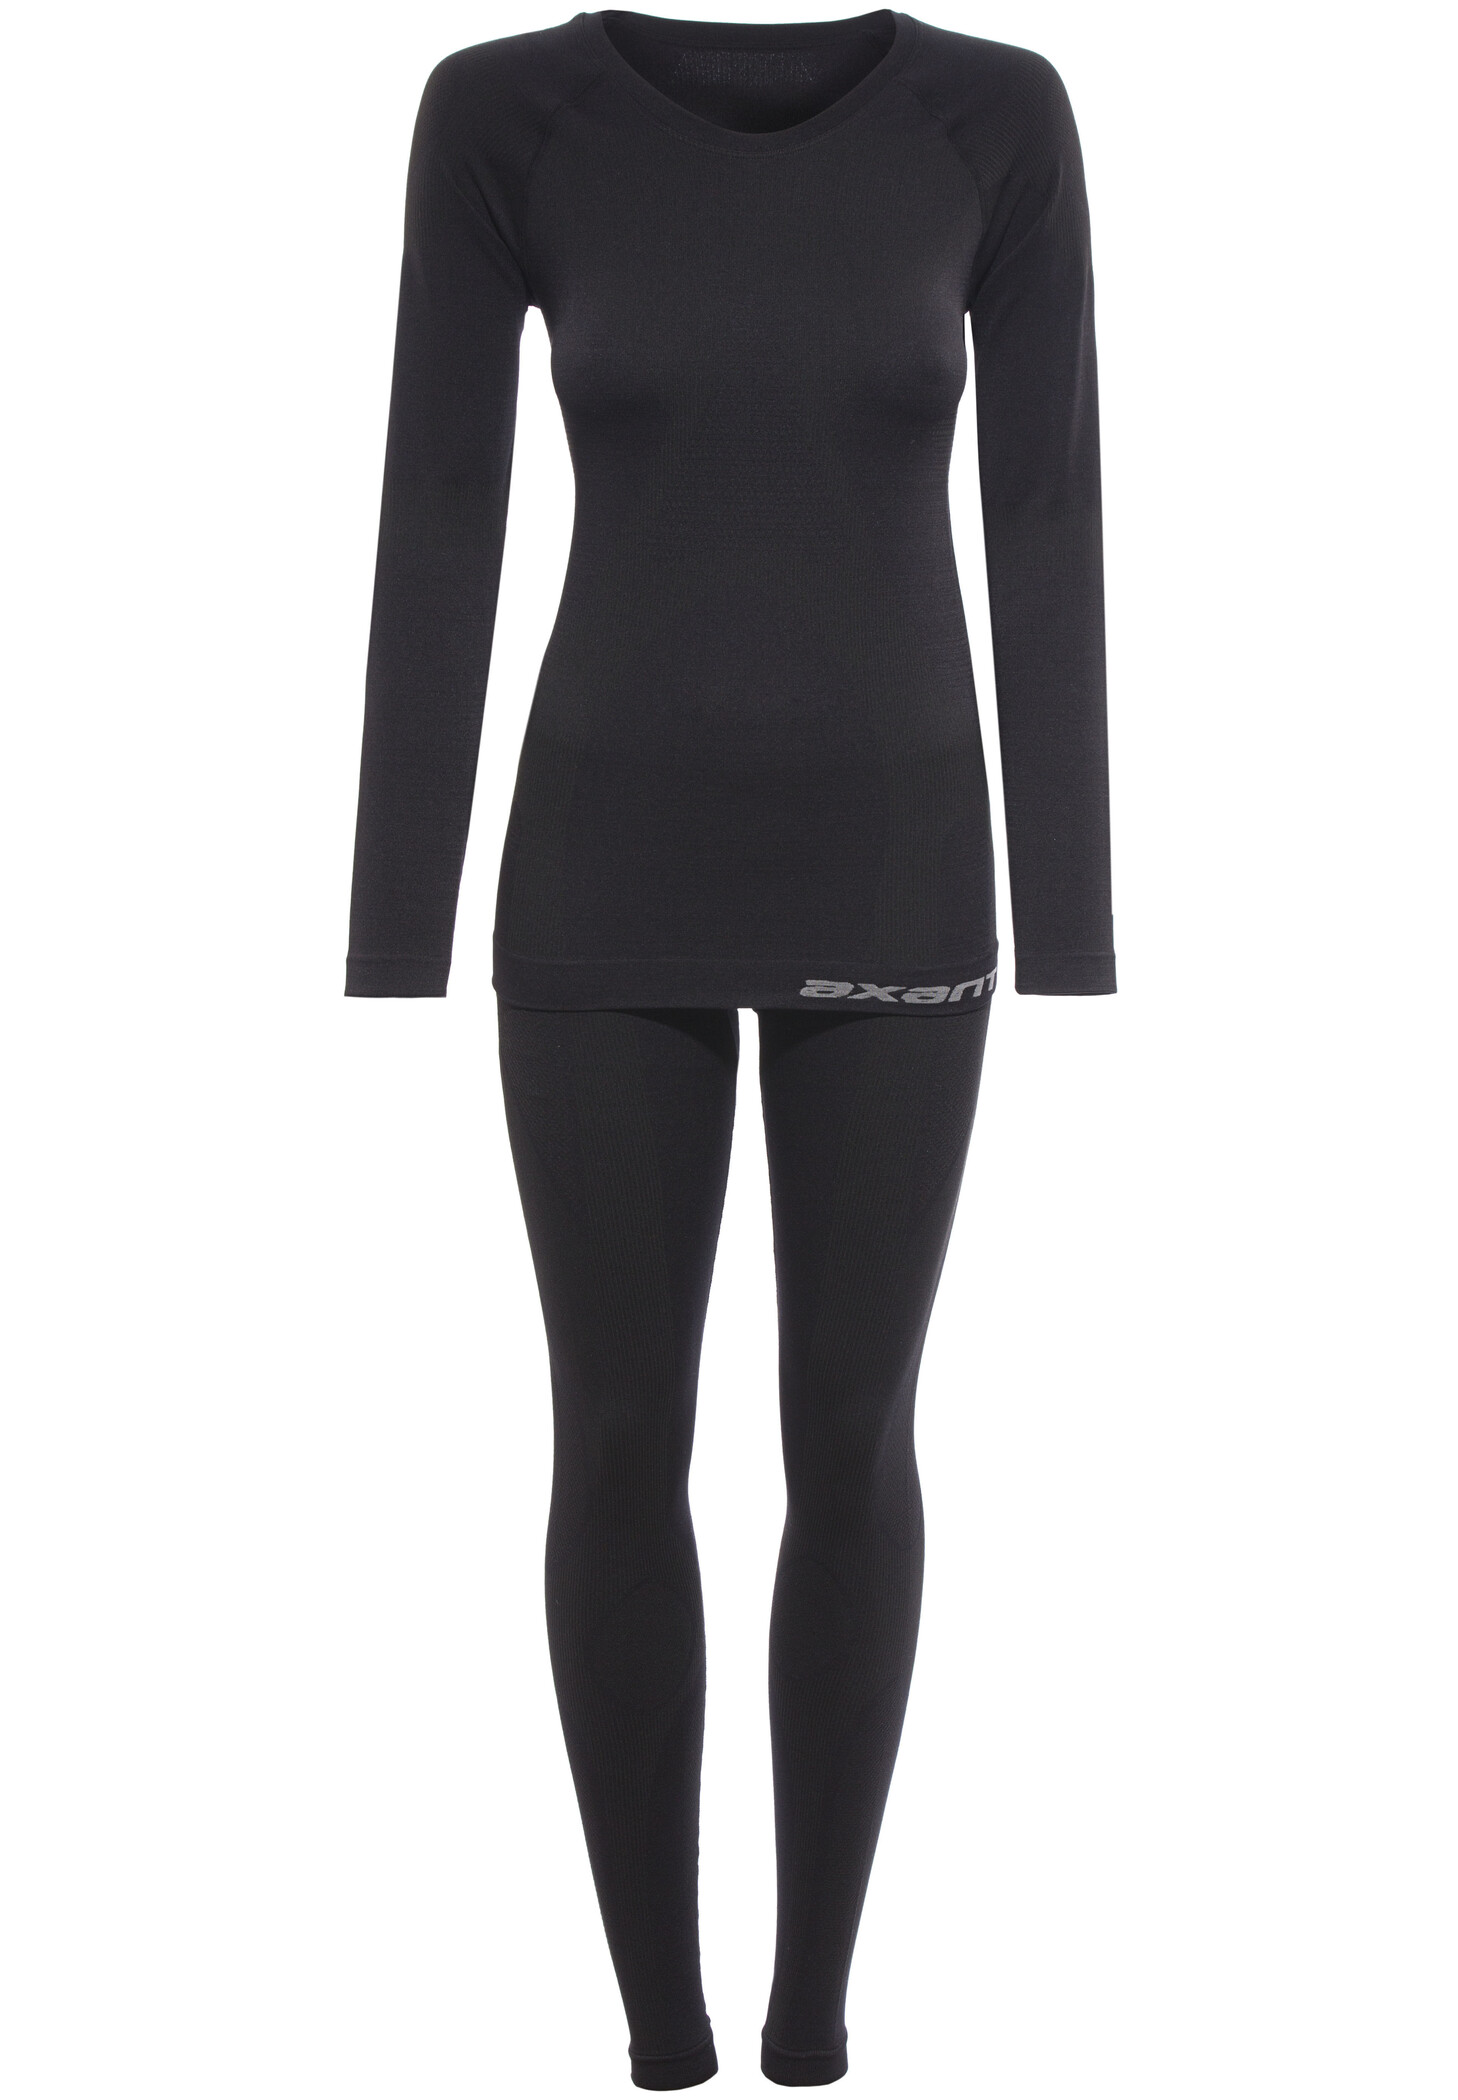 Seamless Langt undertøj Damer, sort | base layer